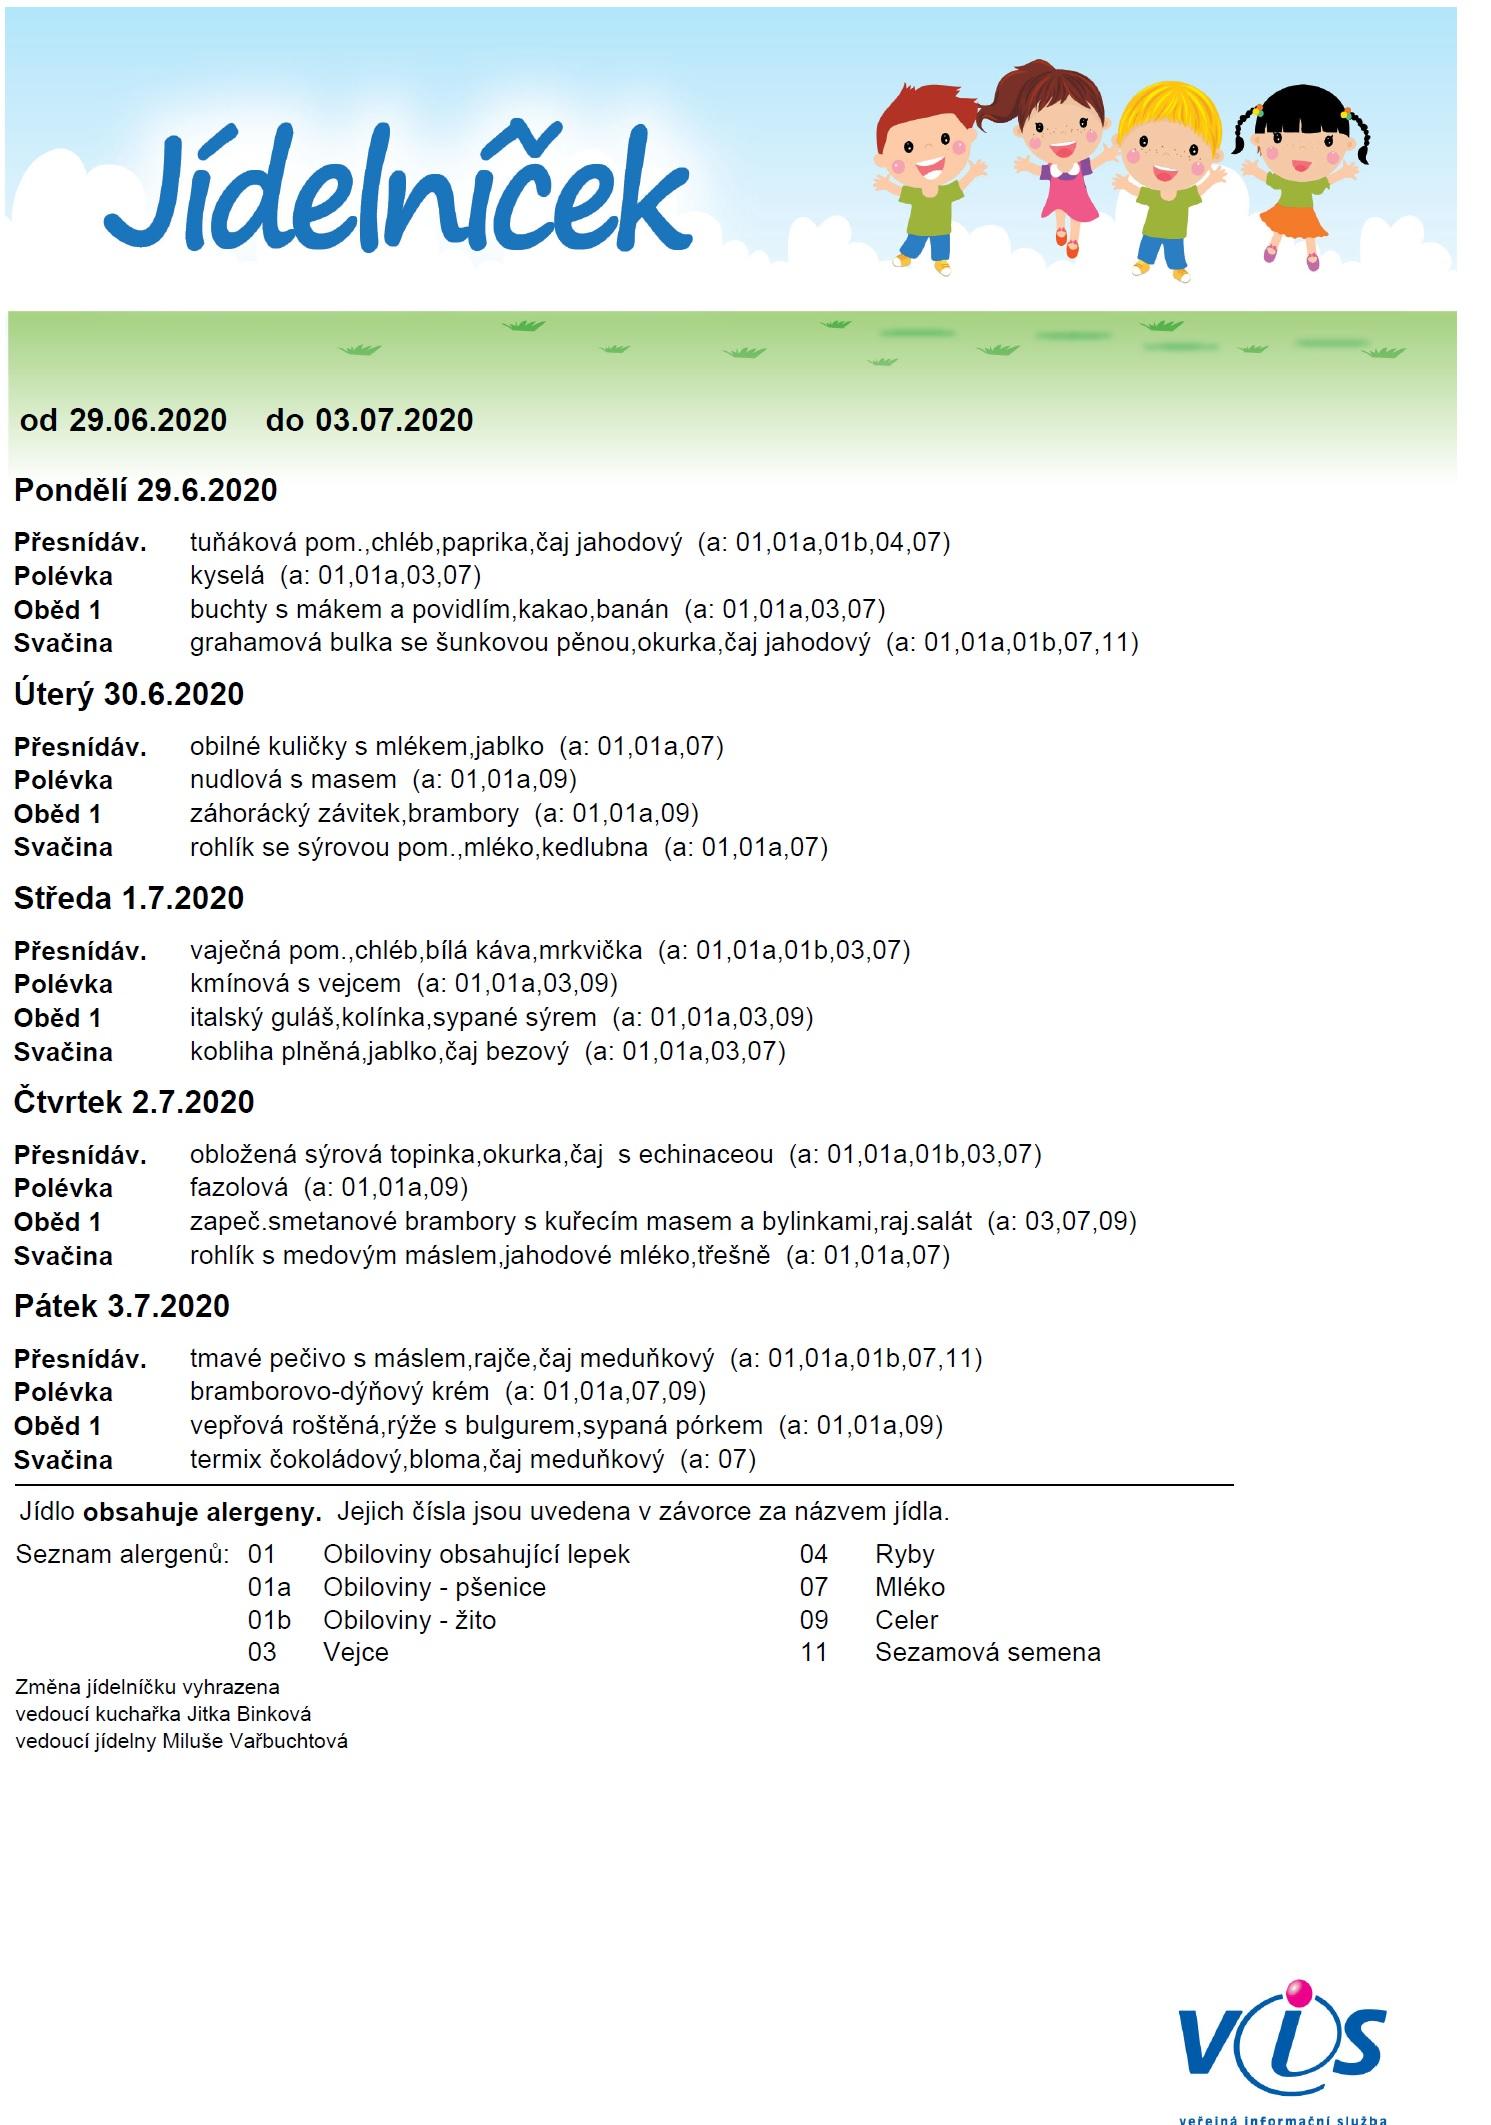 Jídelníček 29.6. - 3.7.2020